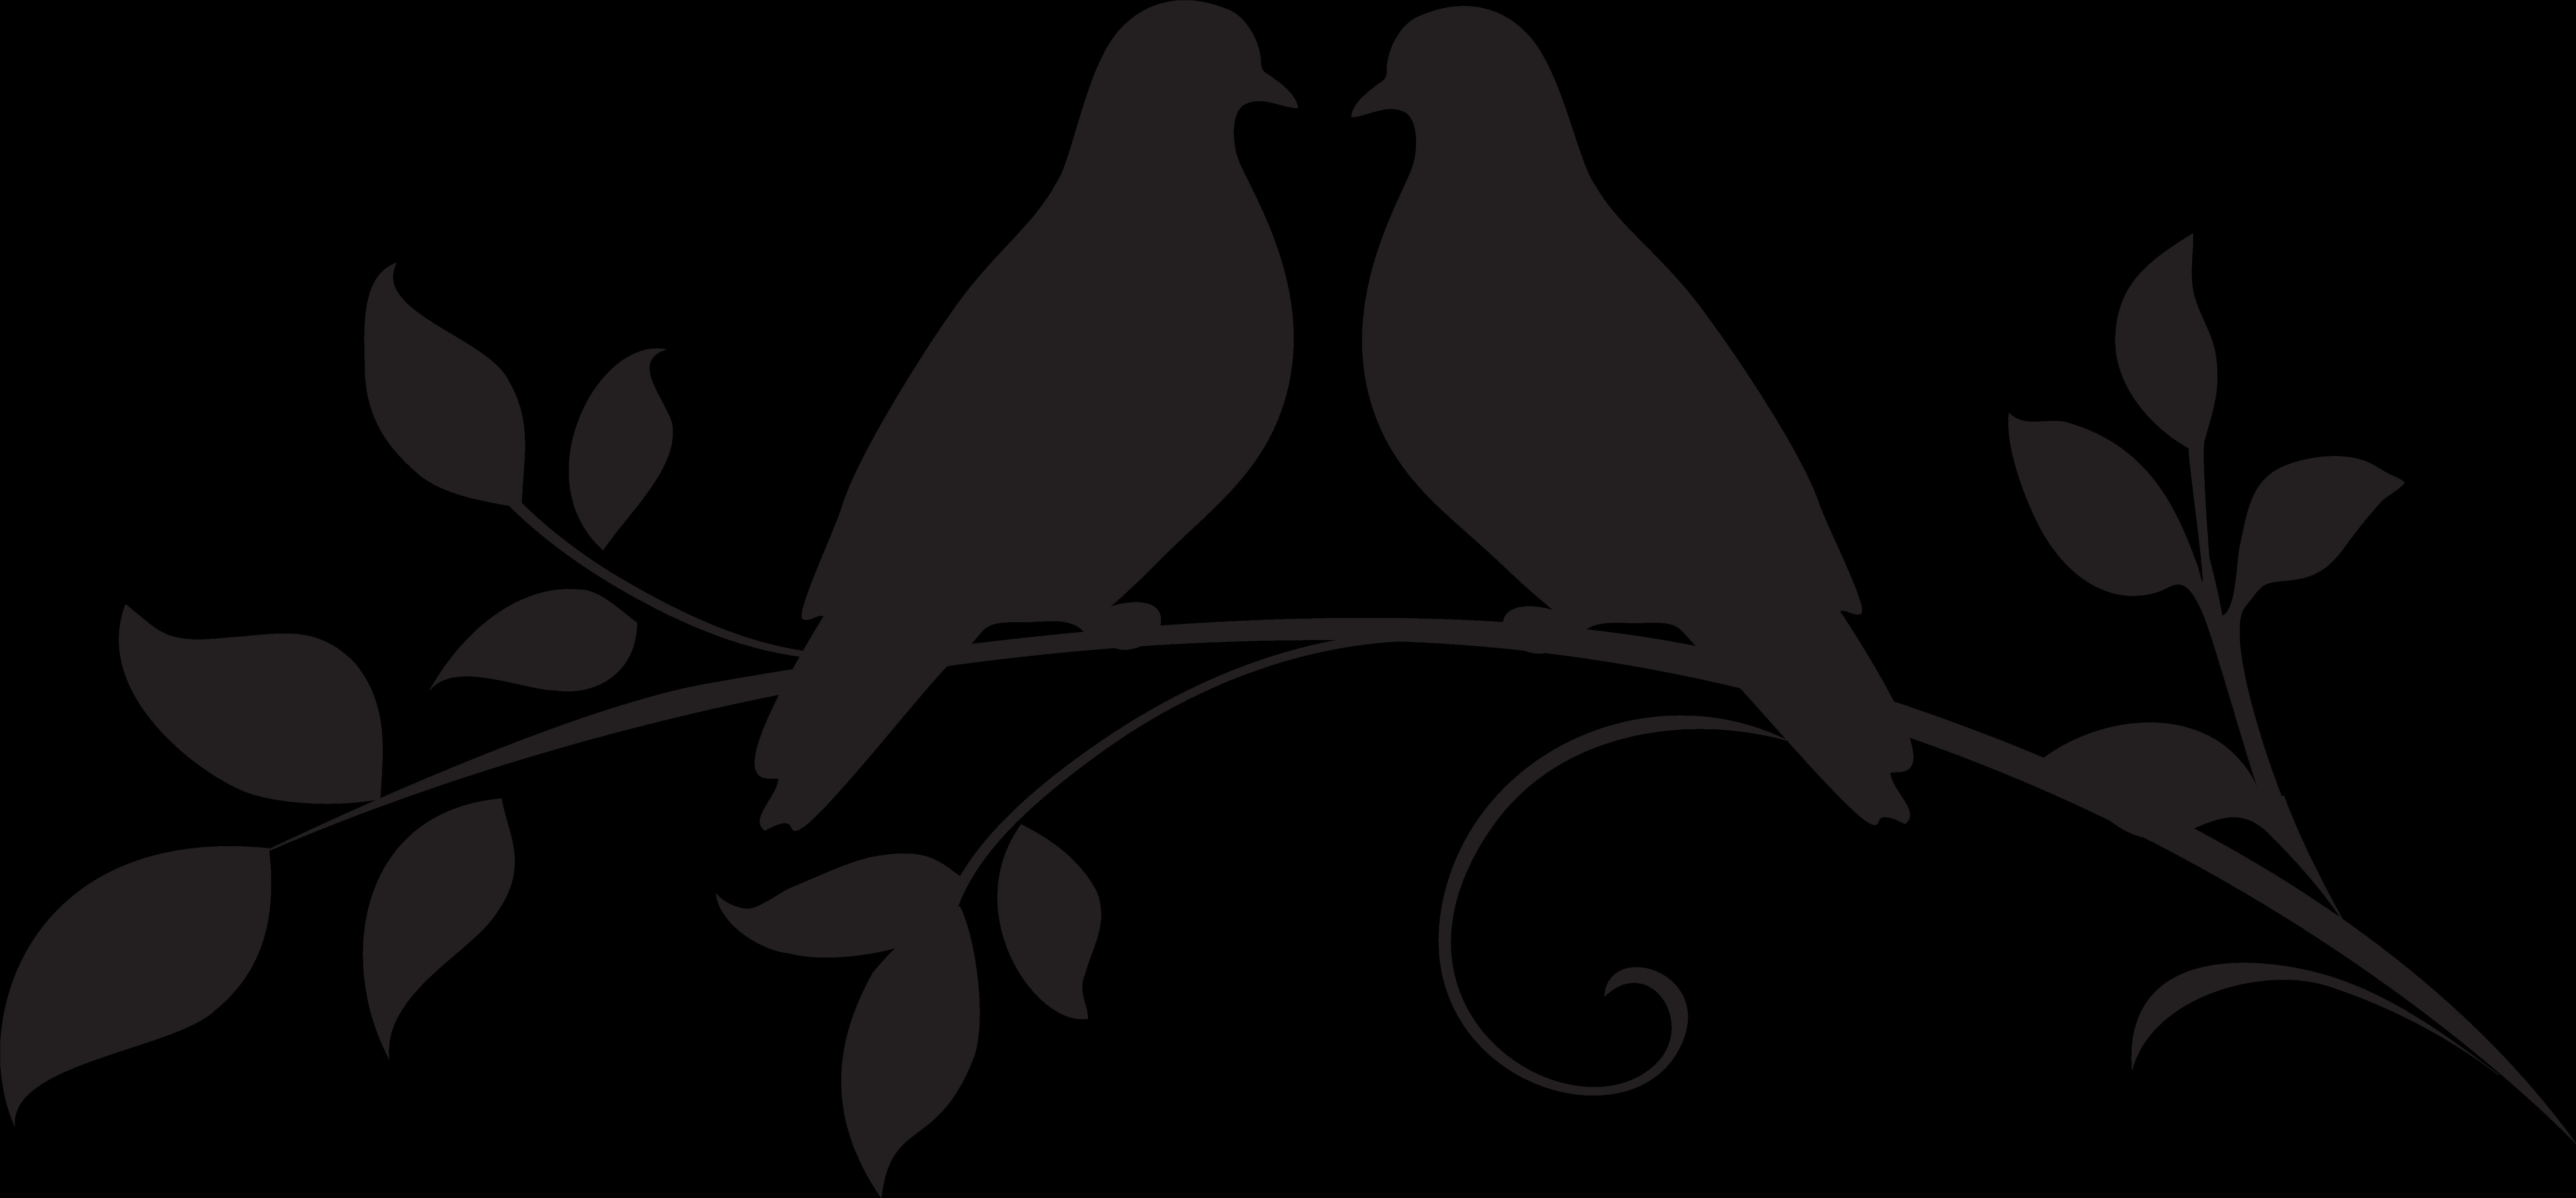 Dove Clipart Silhouette Love Birds Silhouette Png.